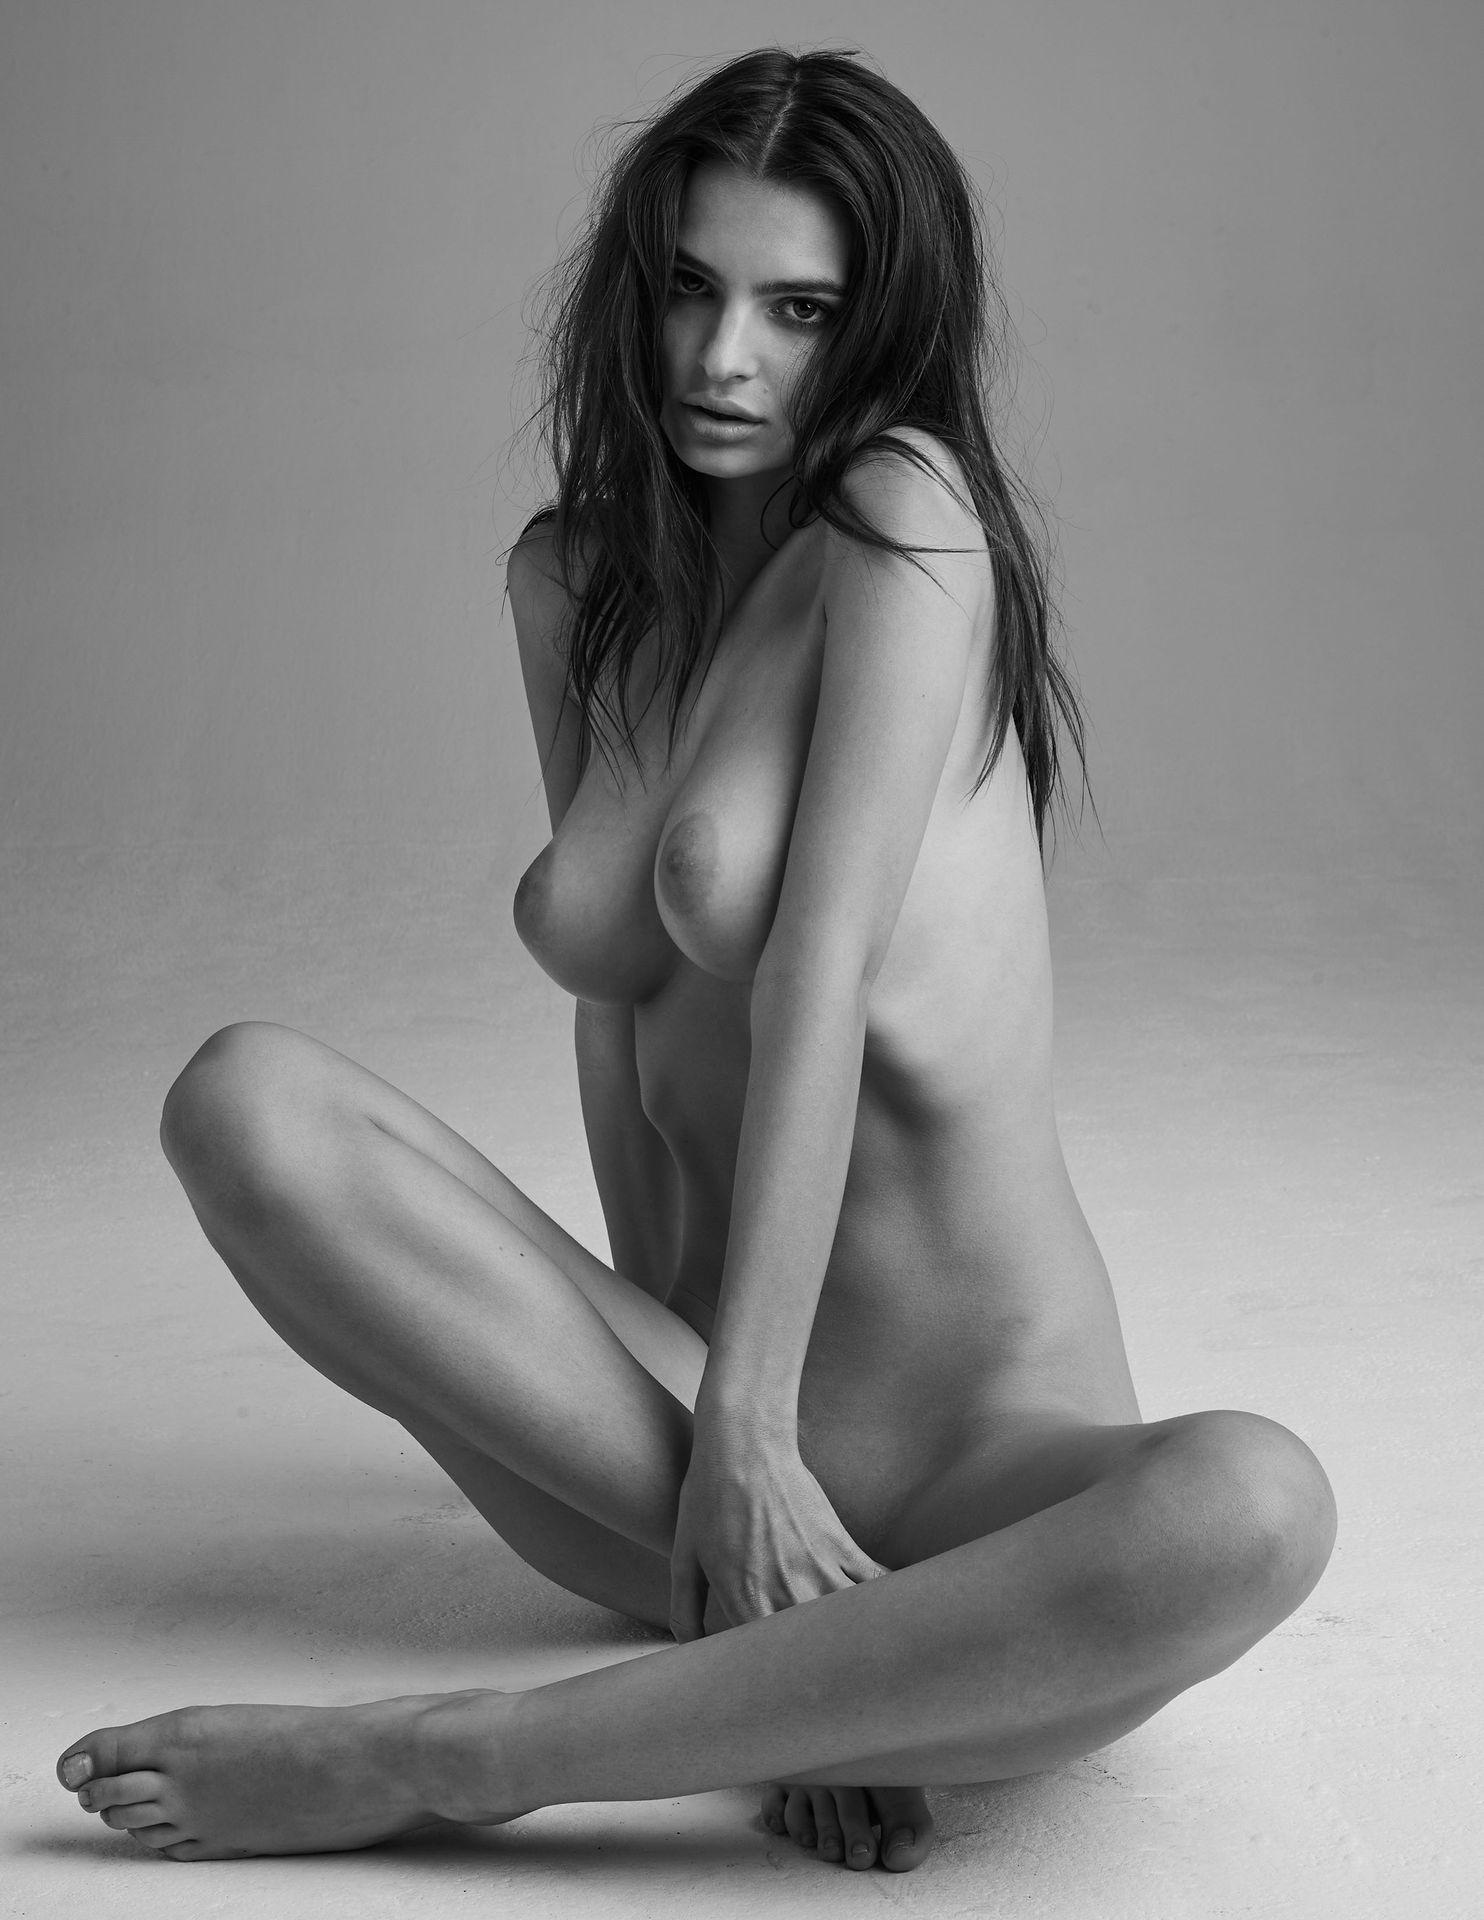 Emily-Ratajkowski-Nude-15-thefappeningblog.com_.jpg